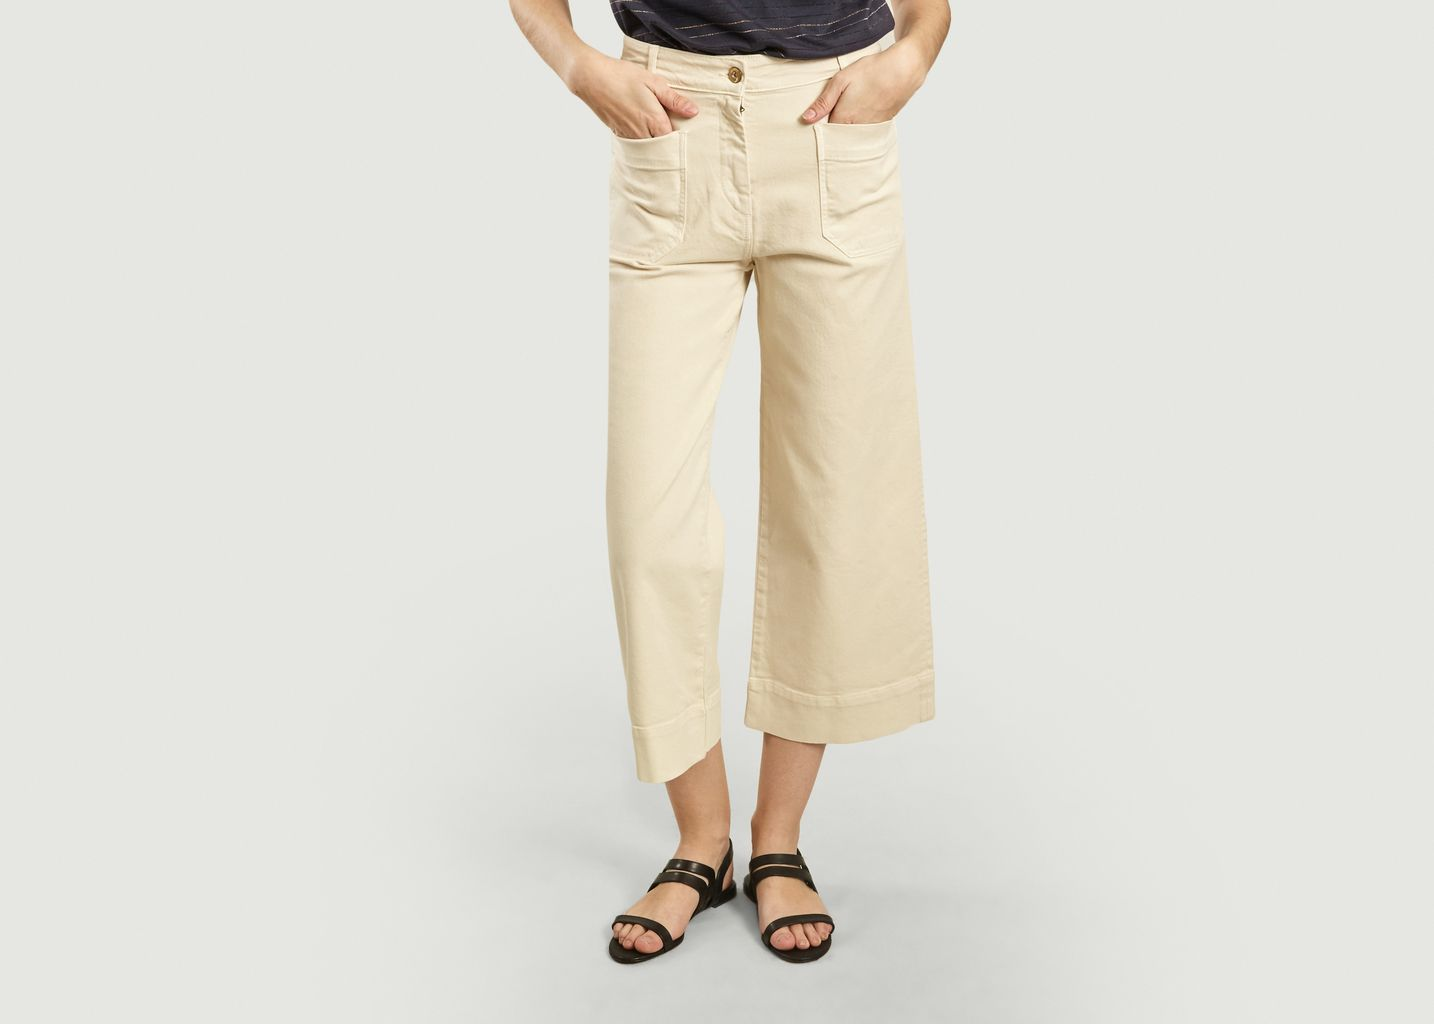 Pantalon Denim Seakey Fleur de Sel  - Sessun